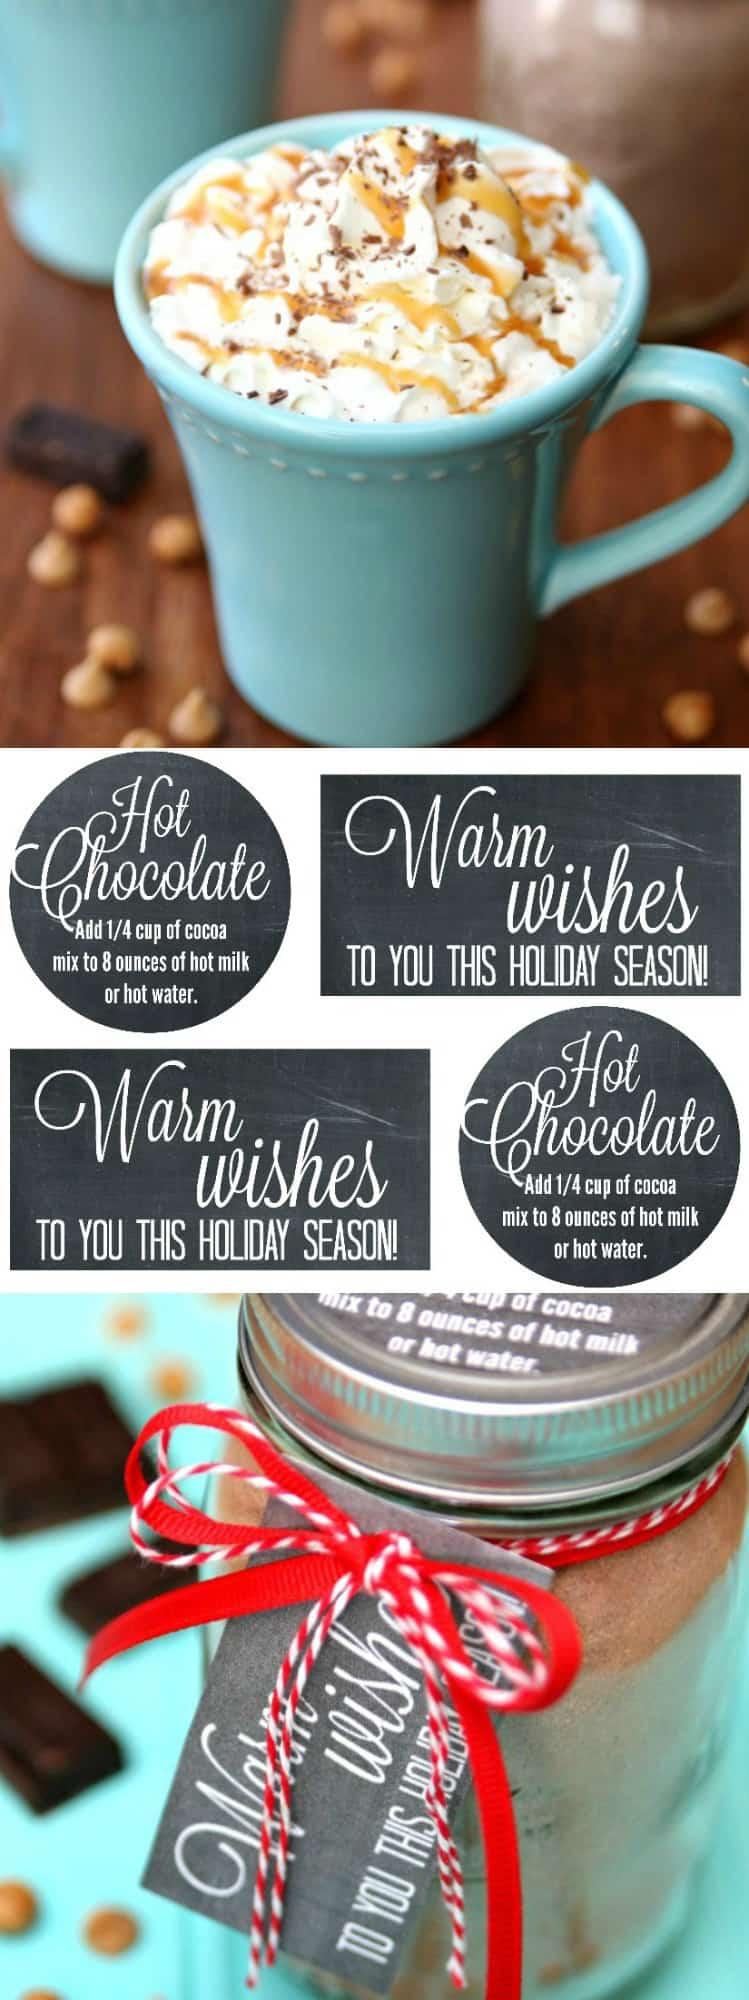 peanut-butter-caramel-hot-chocolate-recipe-and-gift-in-a-jar